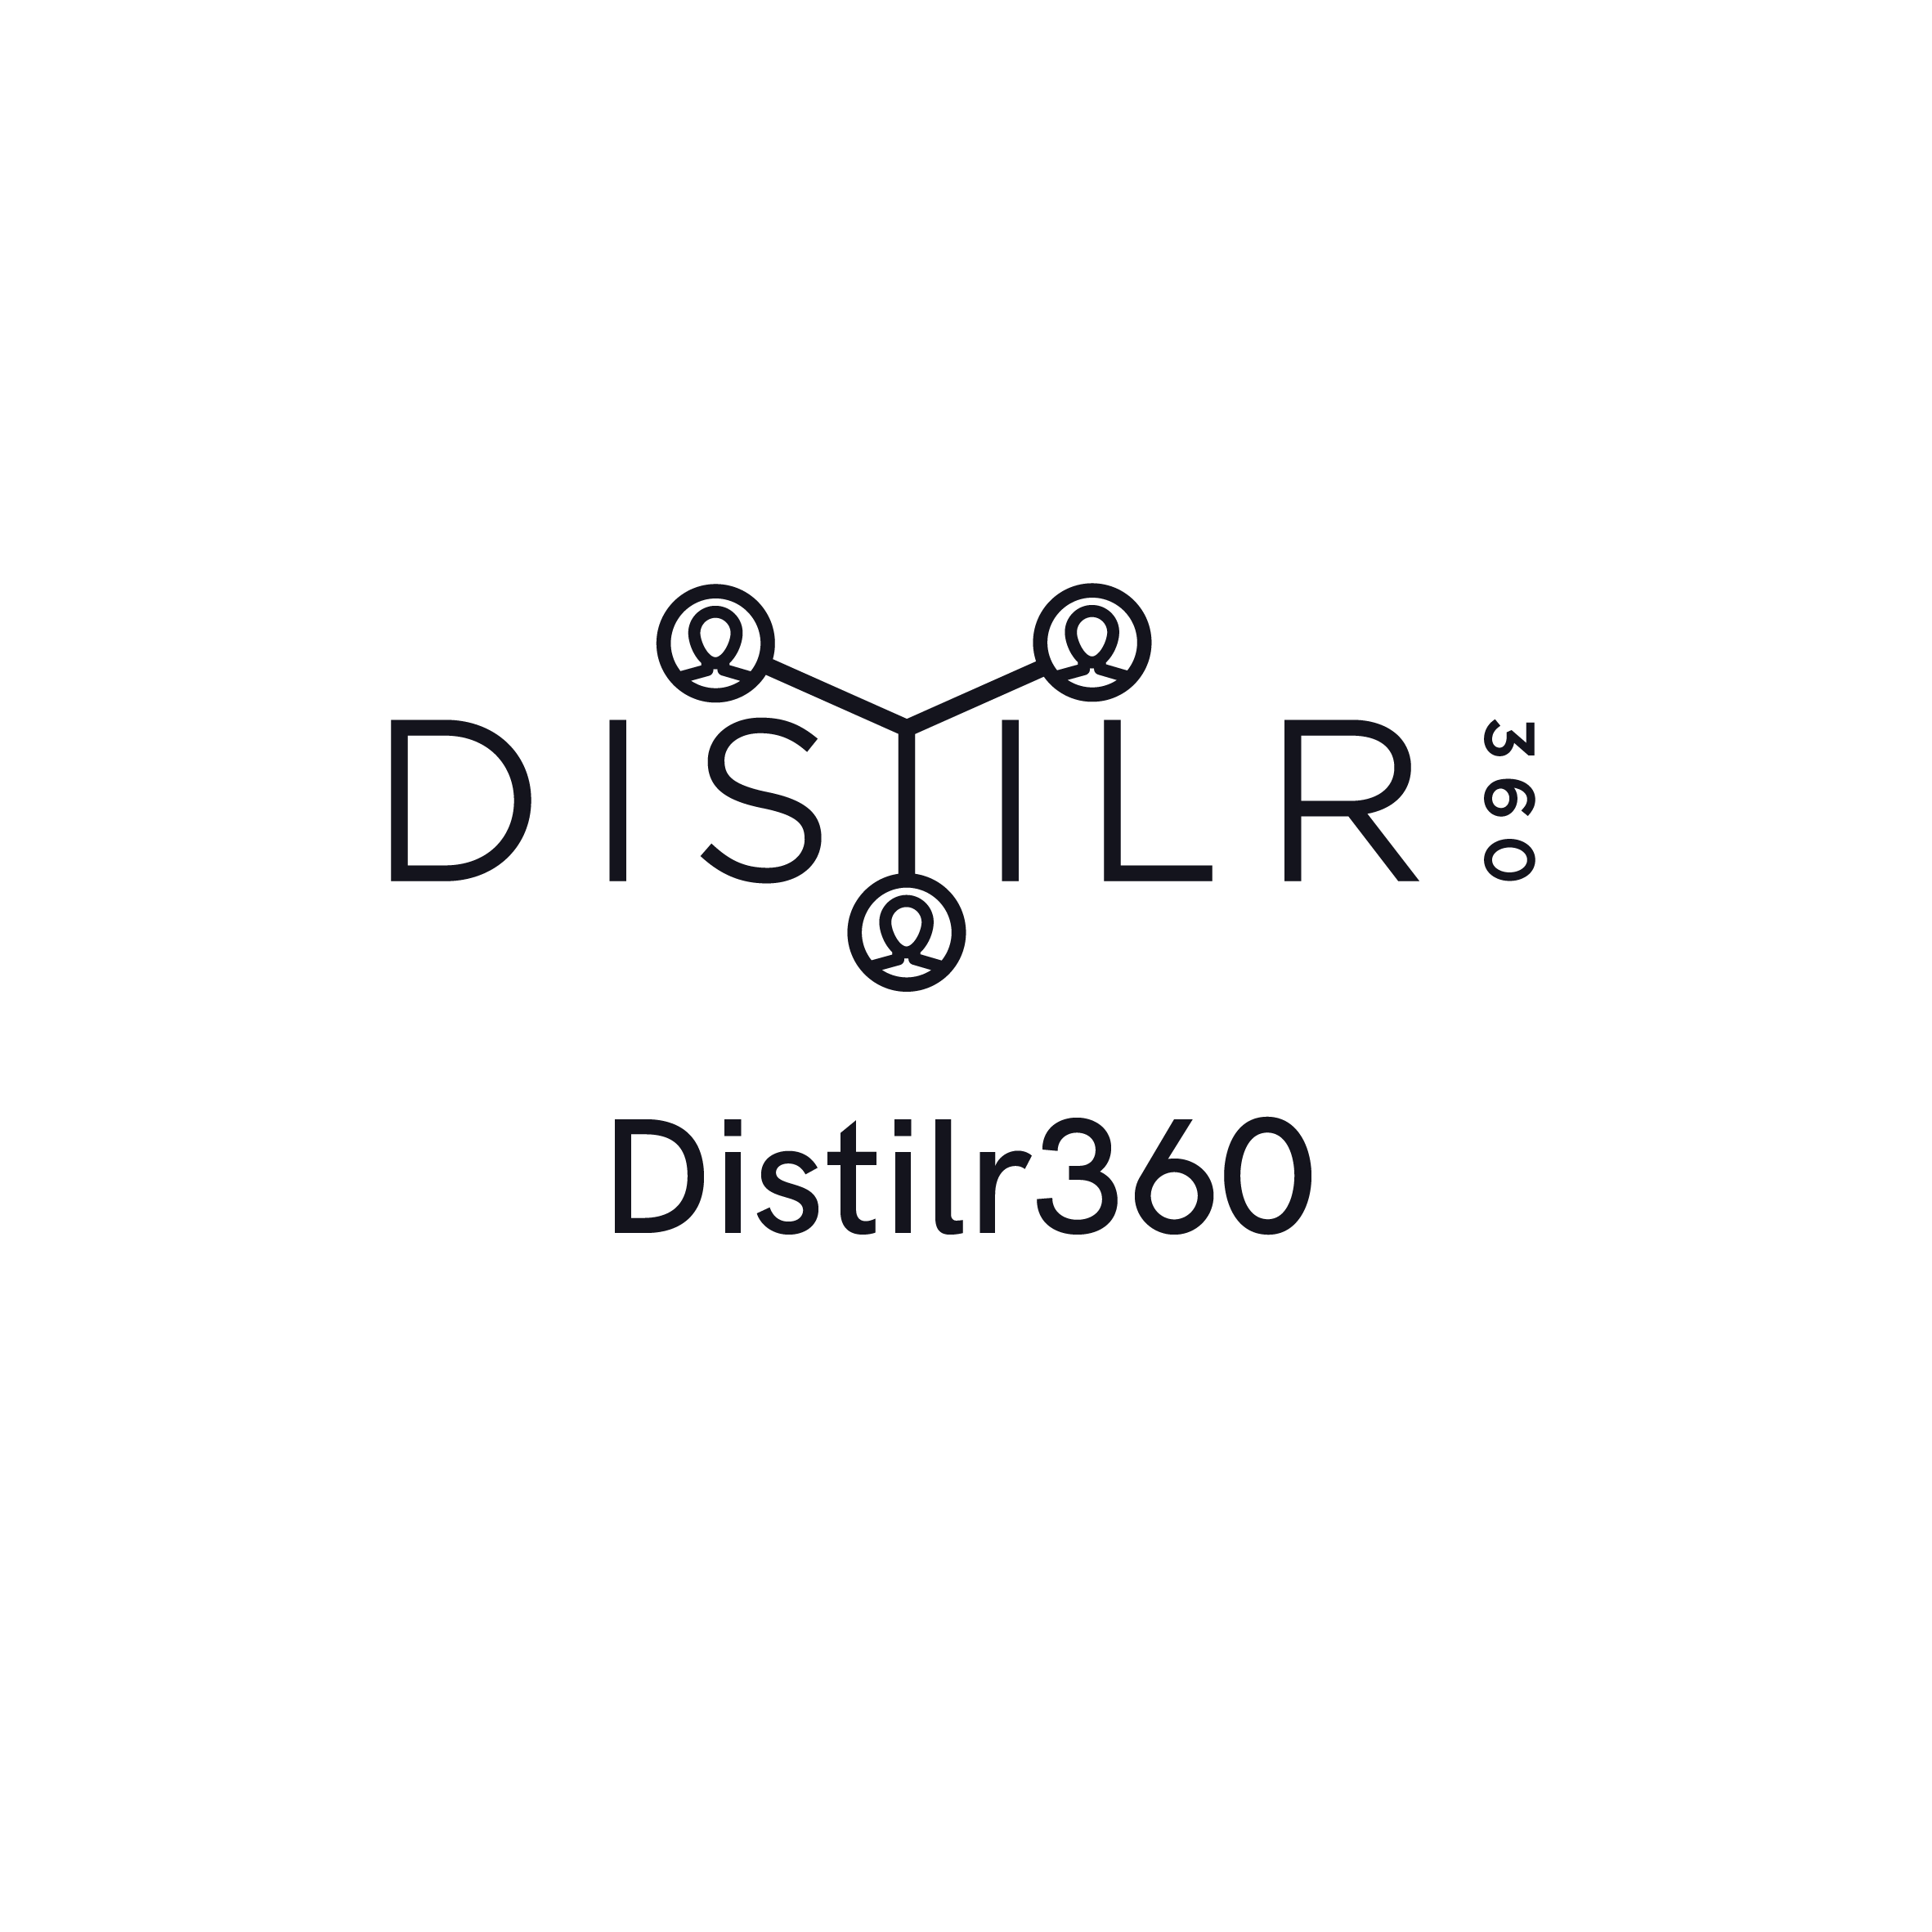 Distilr360 (Blue)